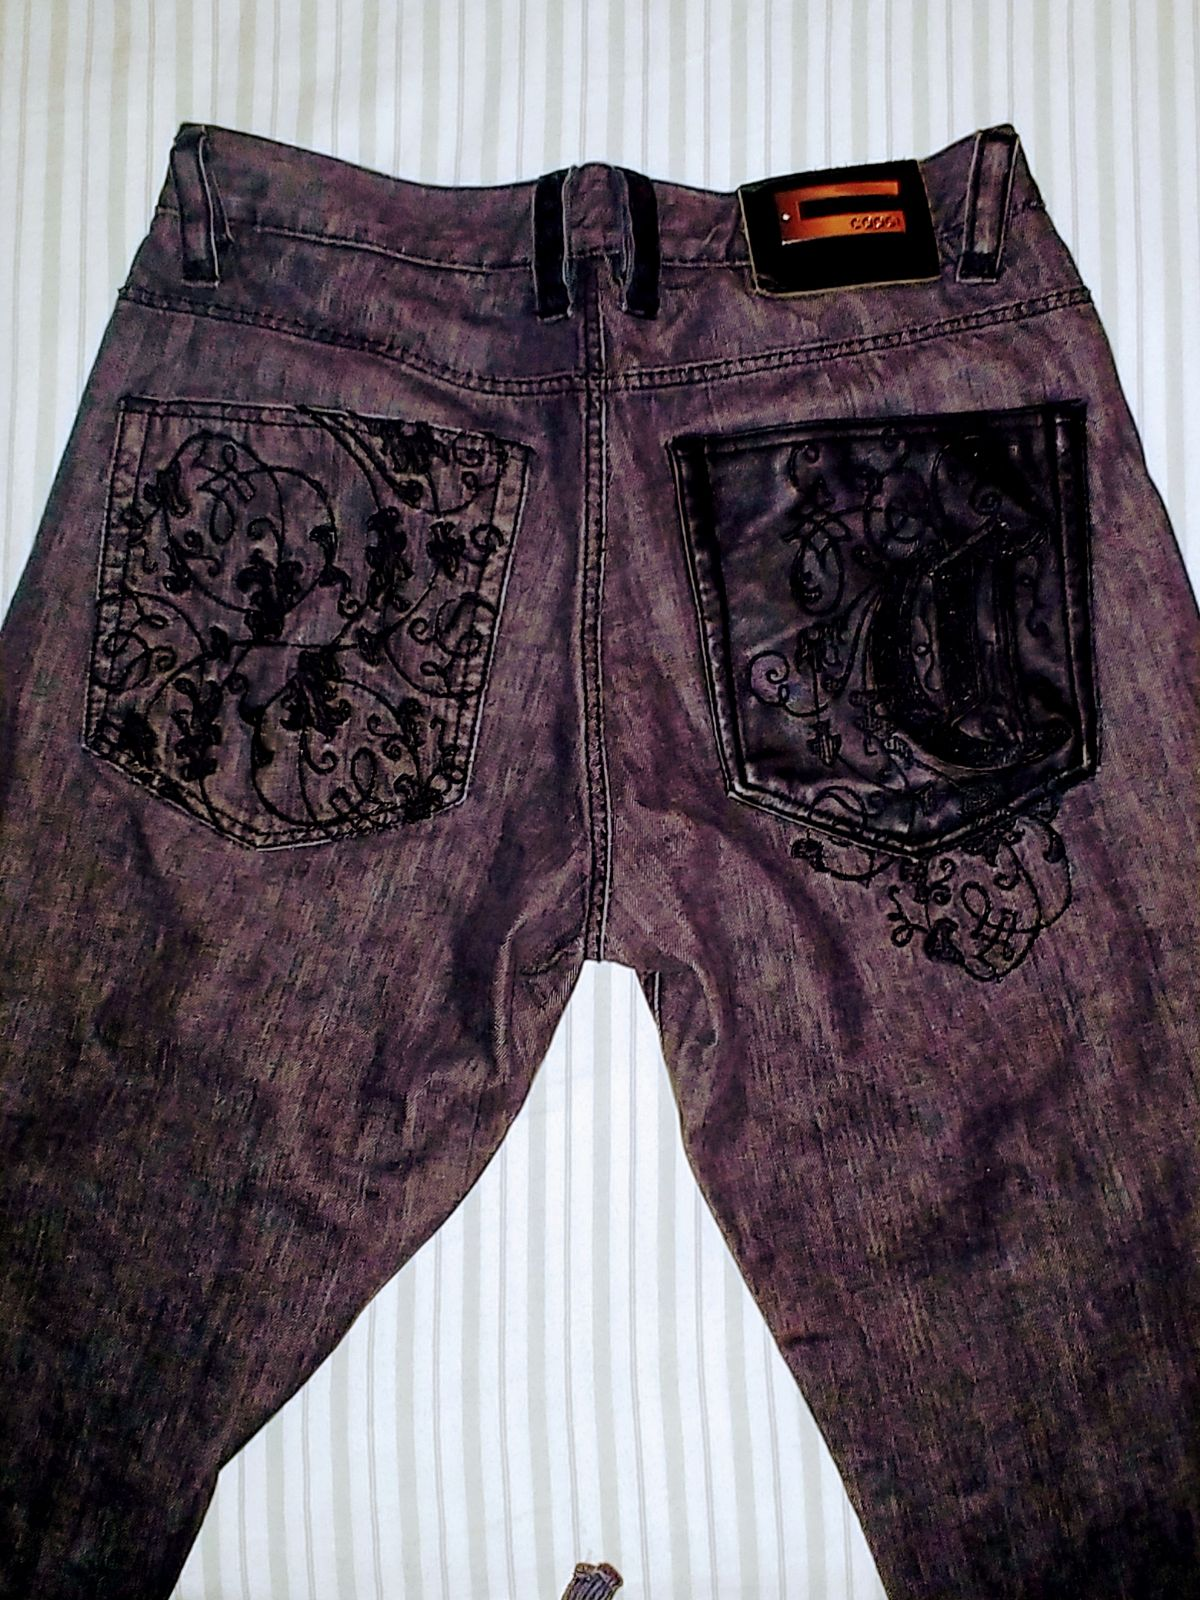 GOOGI pants and shirt